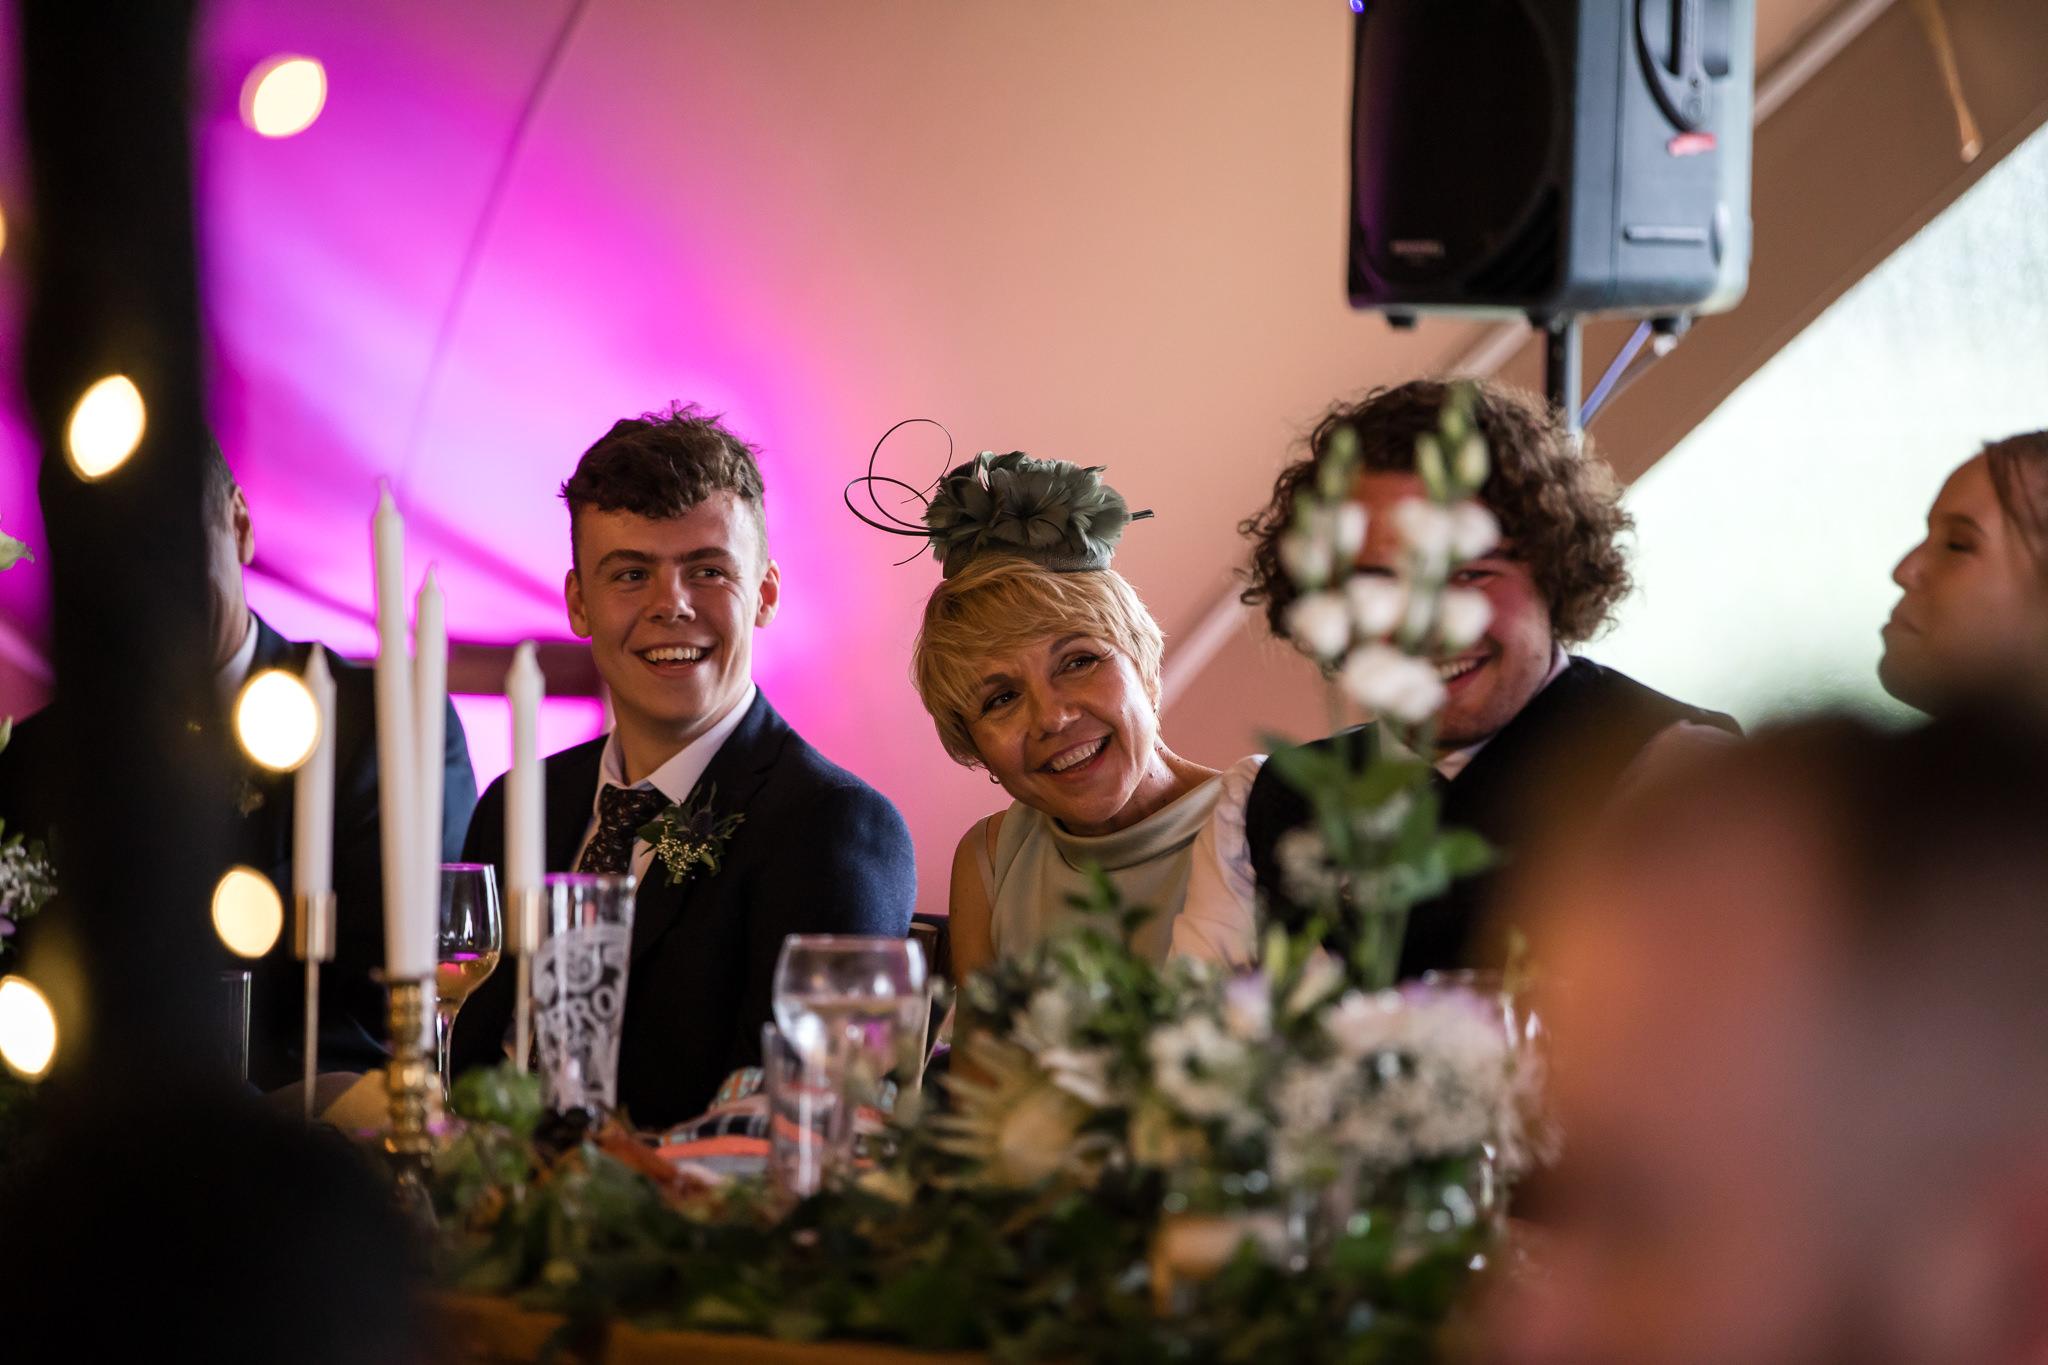 nottingham wedding54